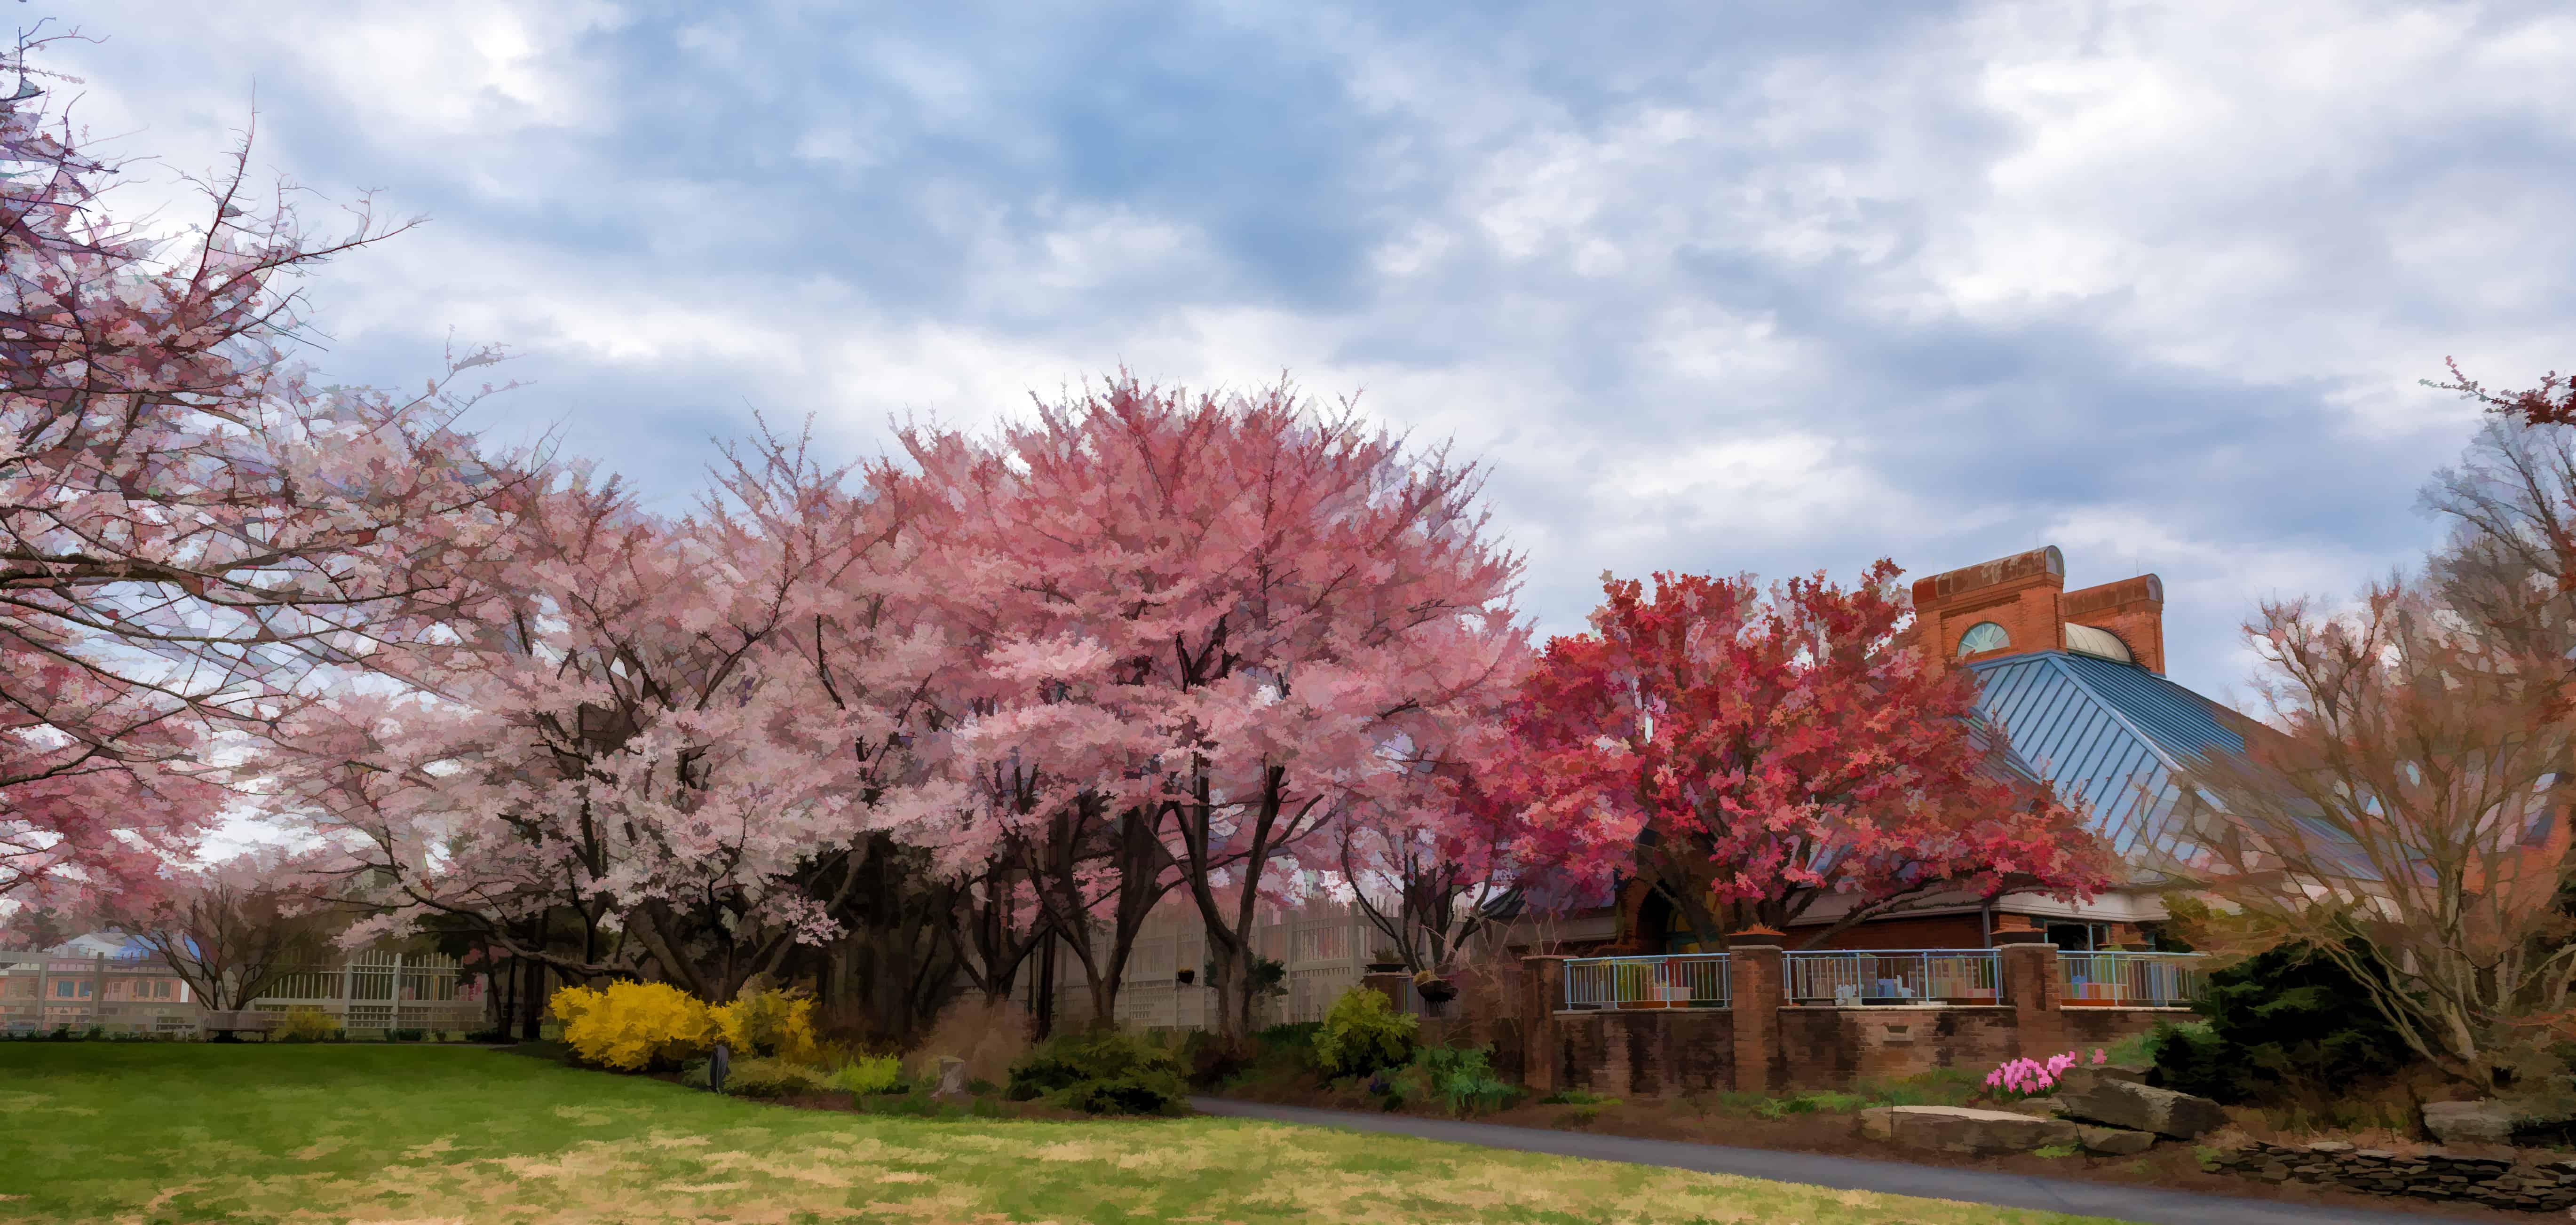 Tour Of The Bonsai Pavilion And Bonsai Care Demonstration National Cherry Blossom Festival